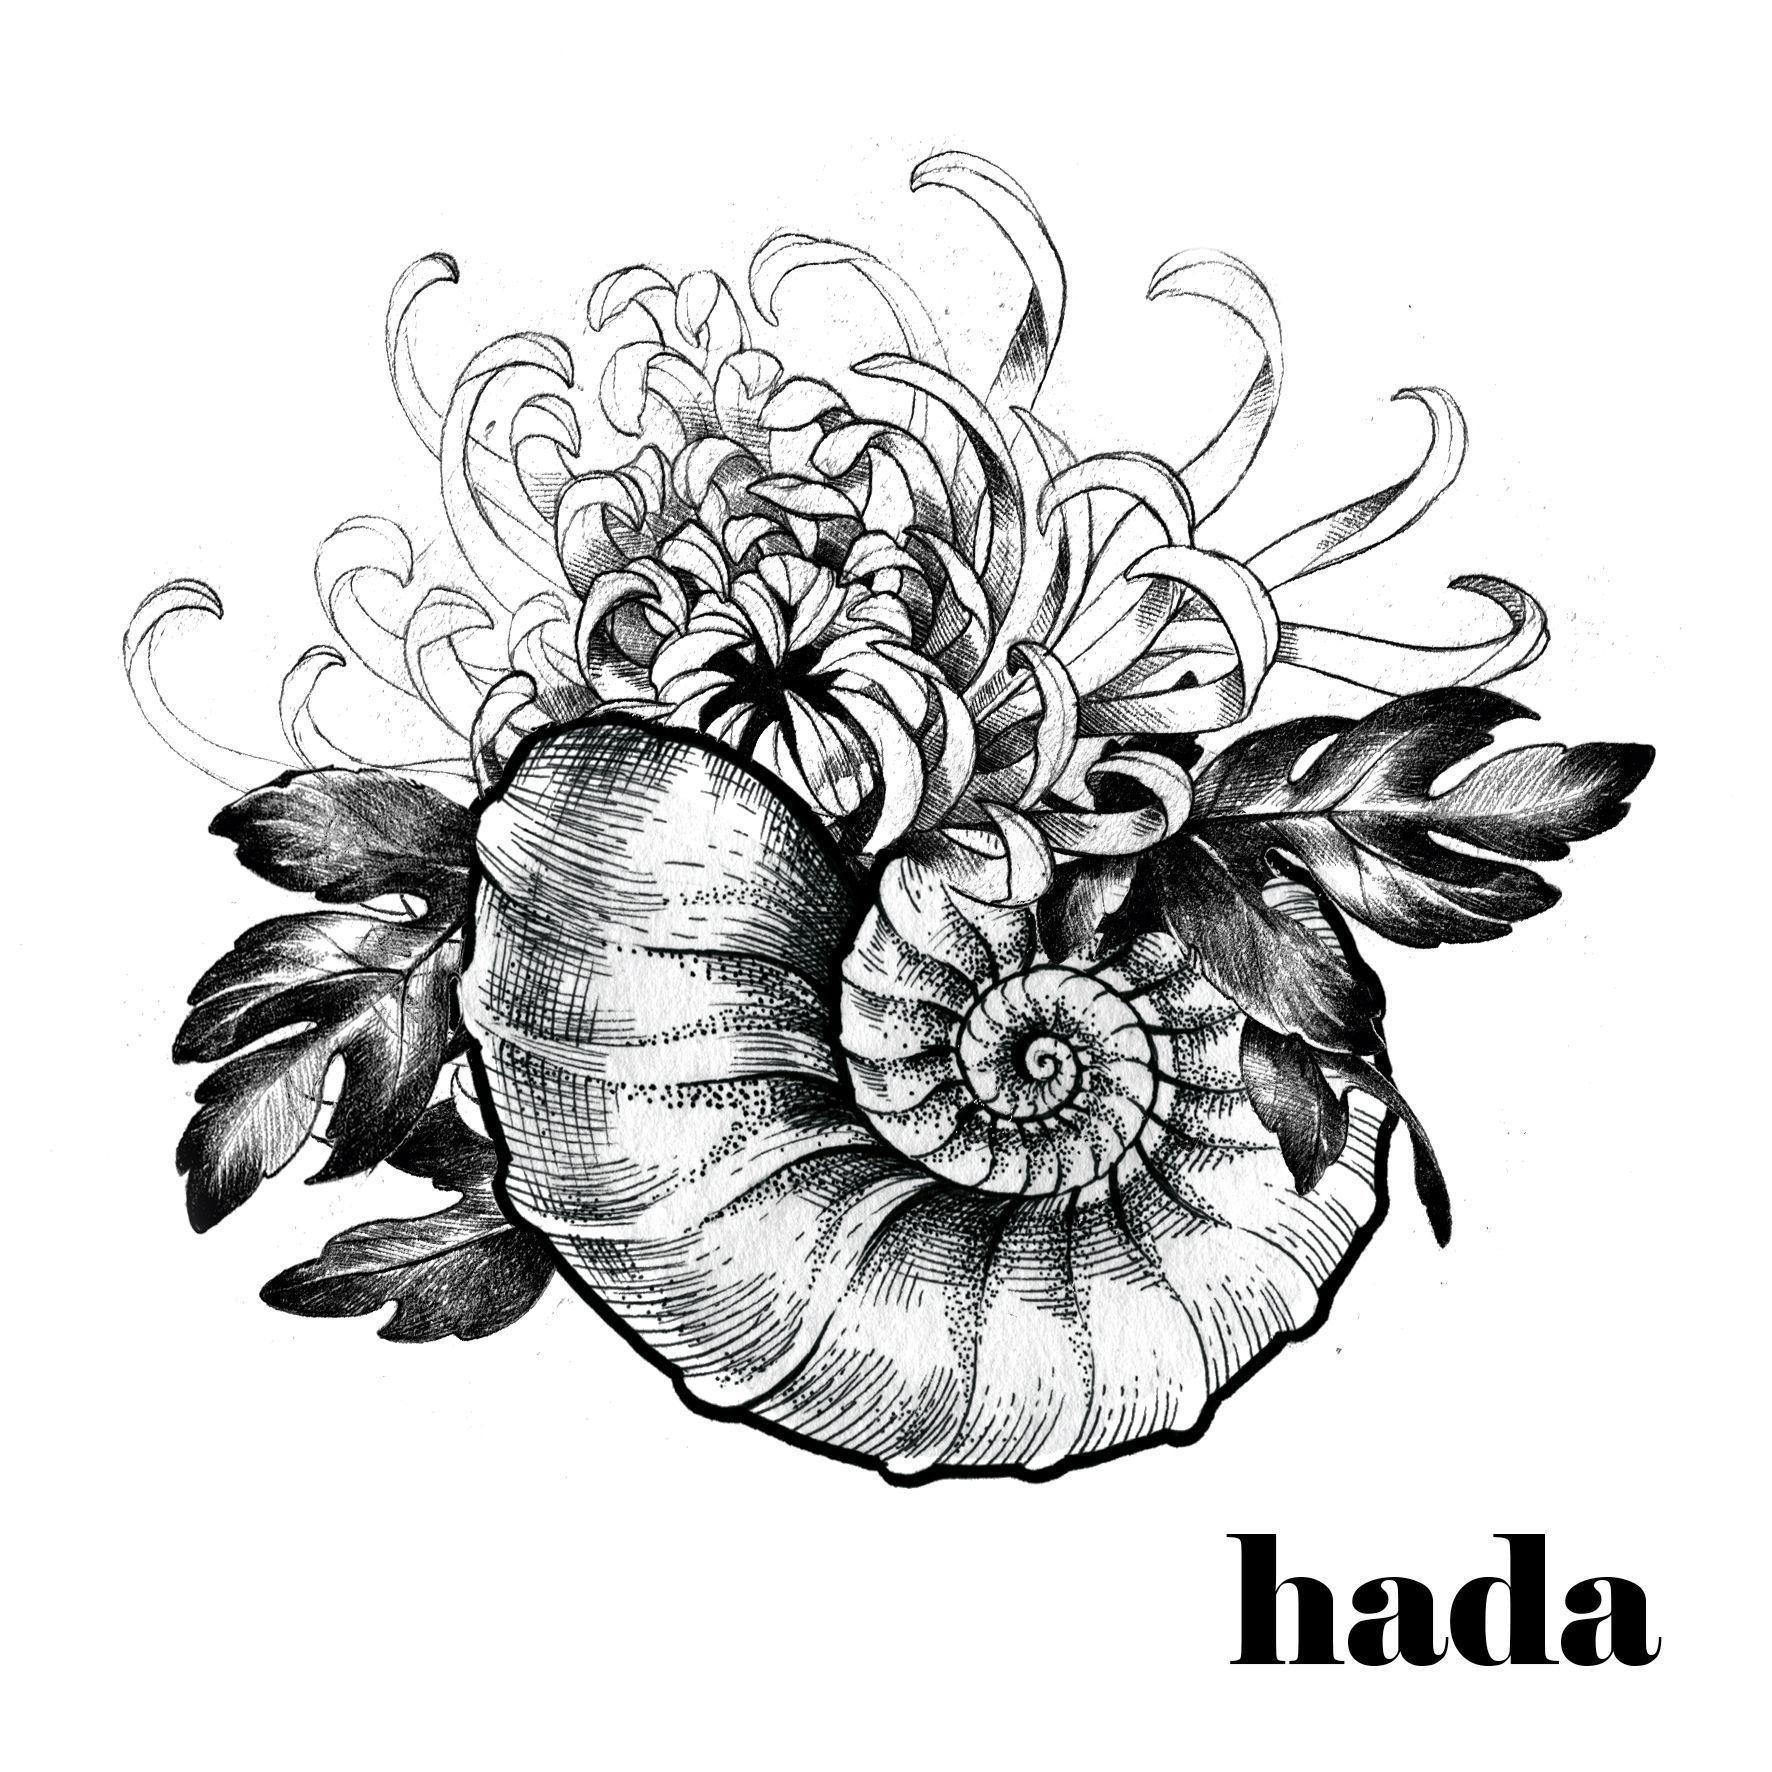 Hada Tattoo Artwork Seashell And Chrysanthemum Reserved Project Artwork Chrysanthemum Coquillage Dessin Tatouages De Coquillage Tatouage Chrysantheme